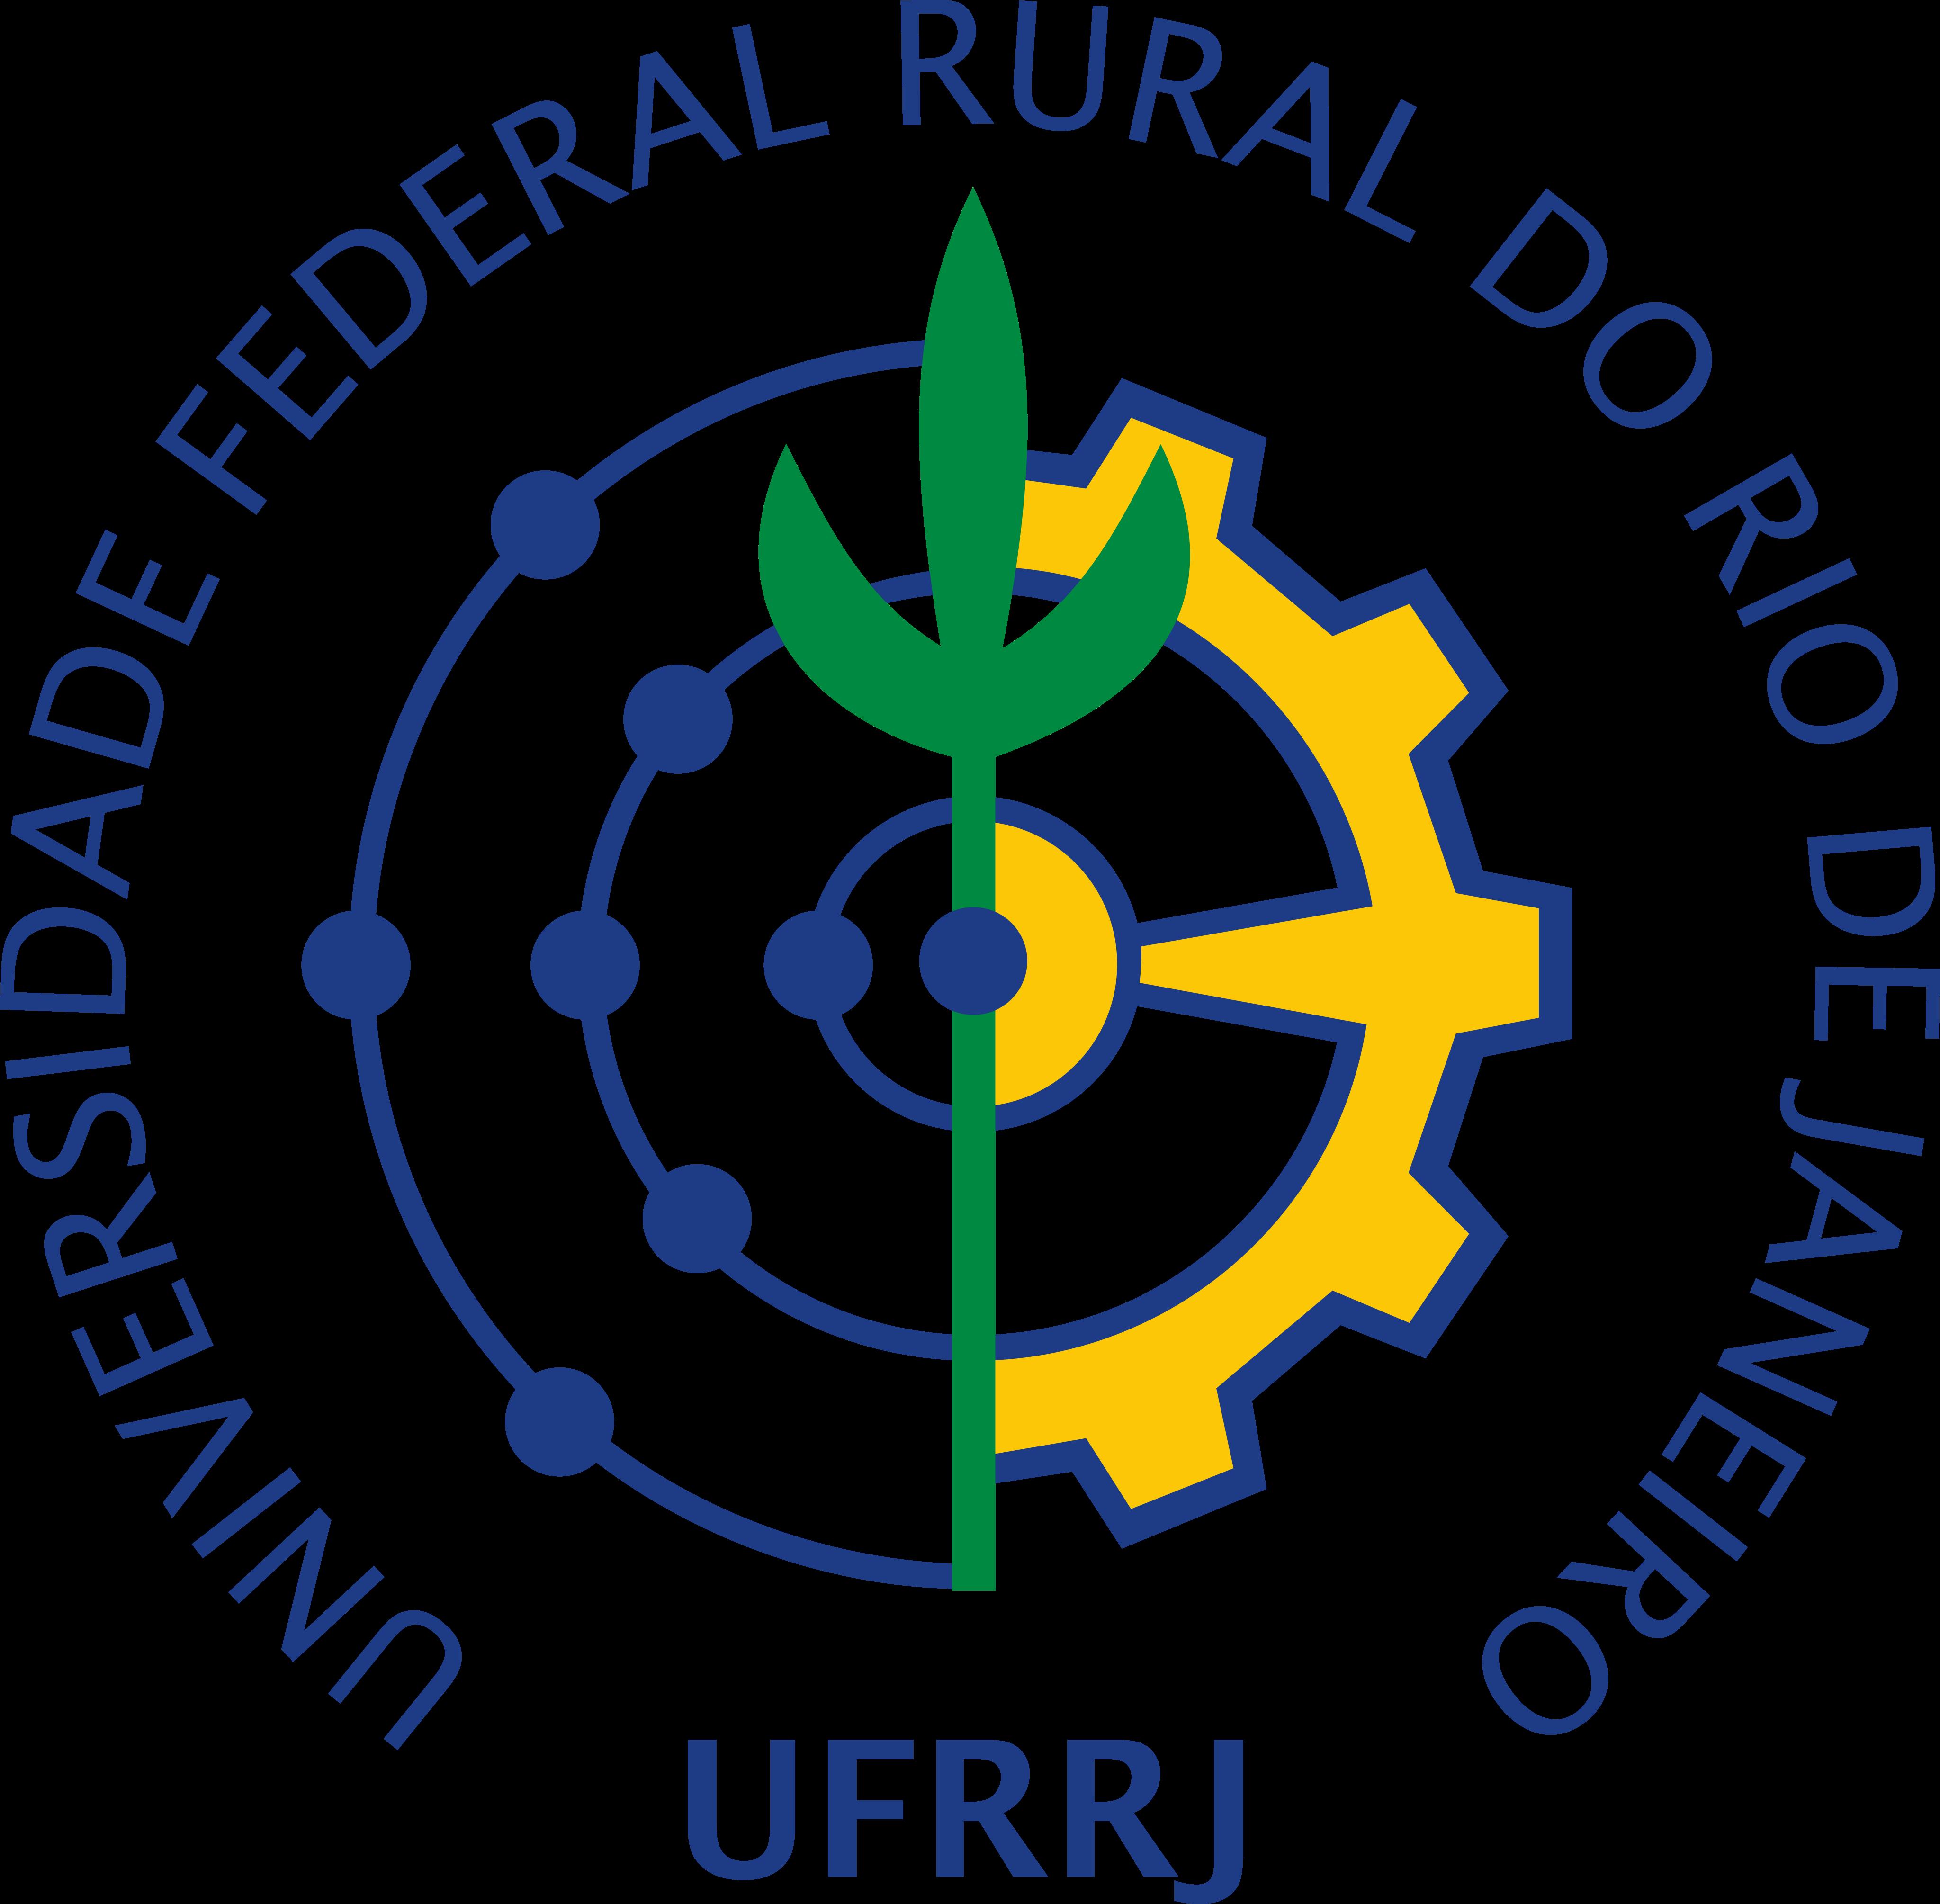 ufrrj logo 1 - UFRRJ Logo